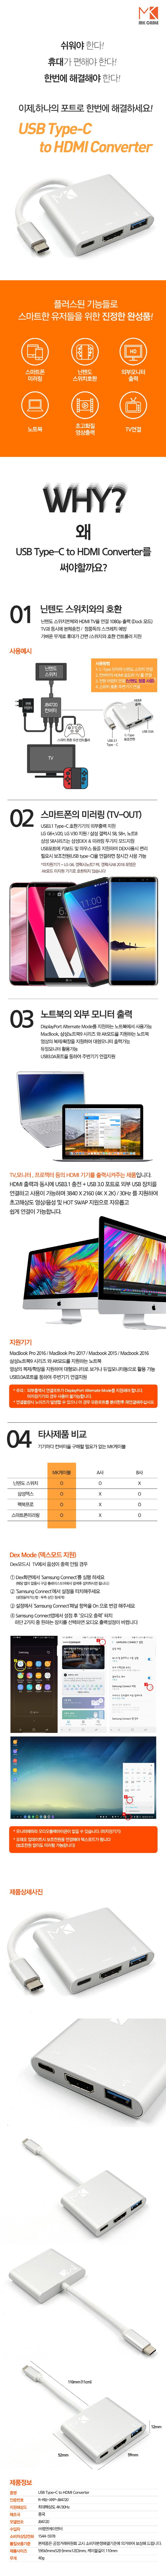 20180209_mnk_USB-Type-C-to-HDMI-Converter%20770.jpg